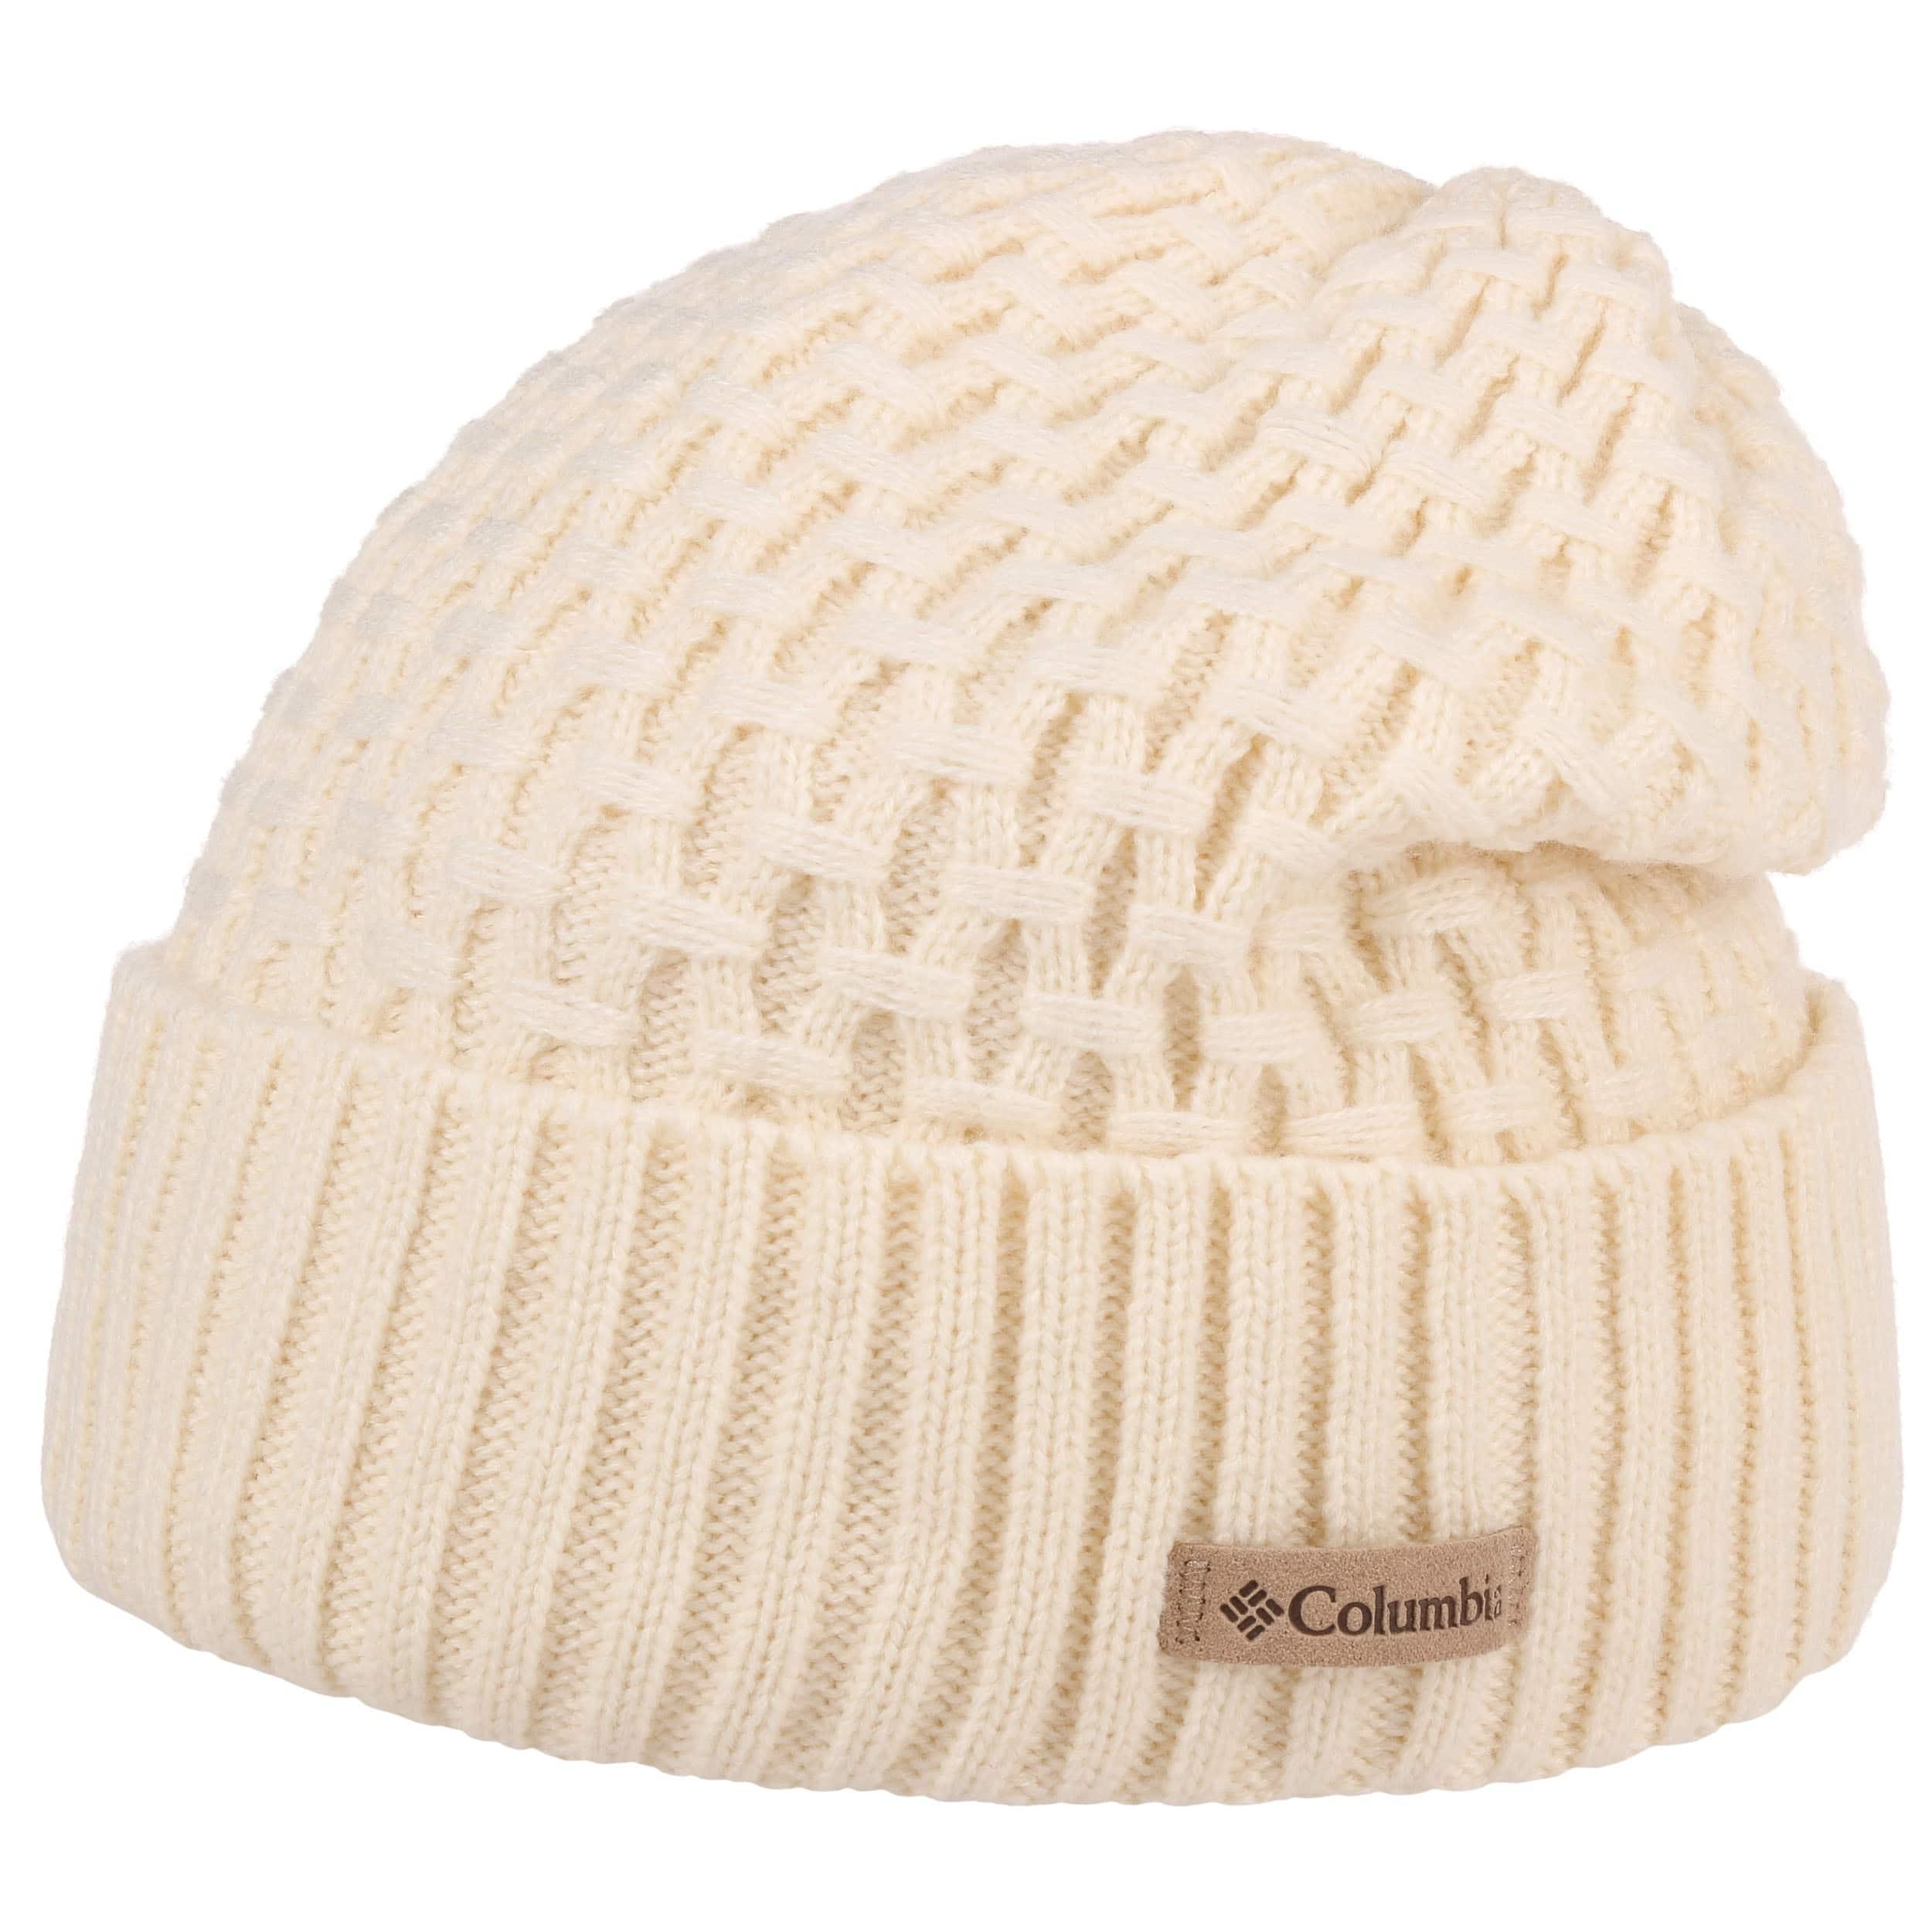 e6386f46ea5cbb ... Hideaway Haven Beanie Hat by Columbia - cream white 4